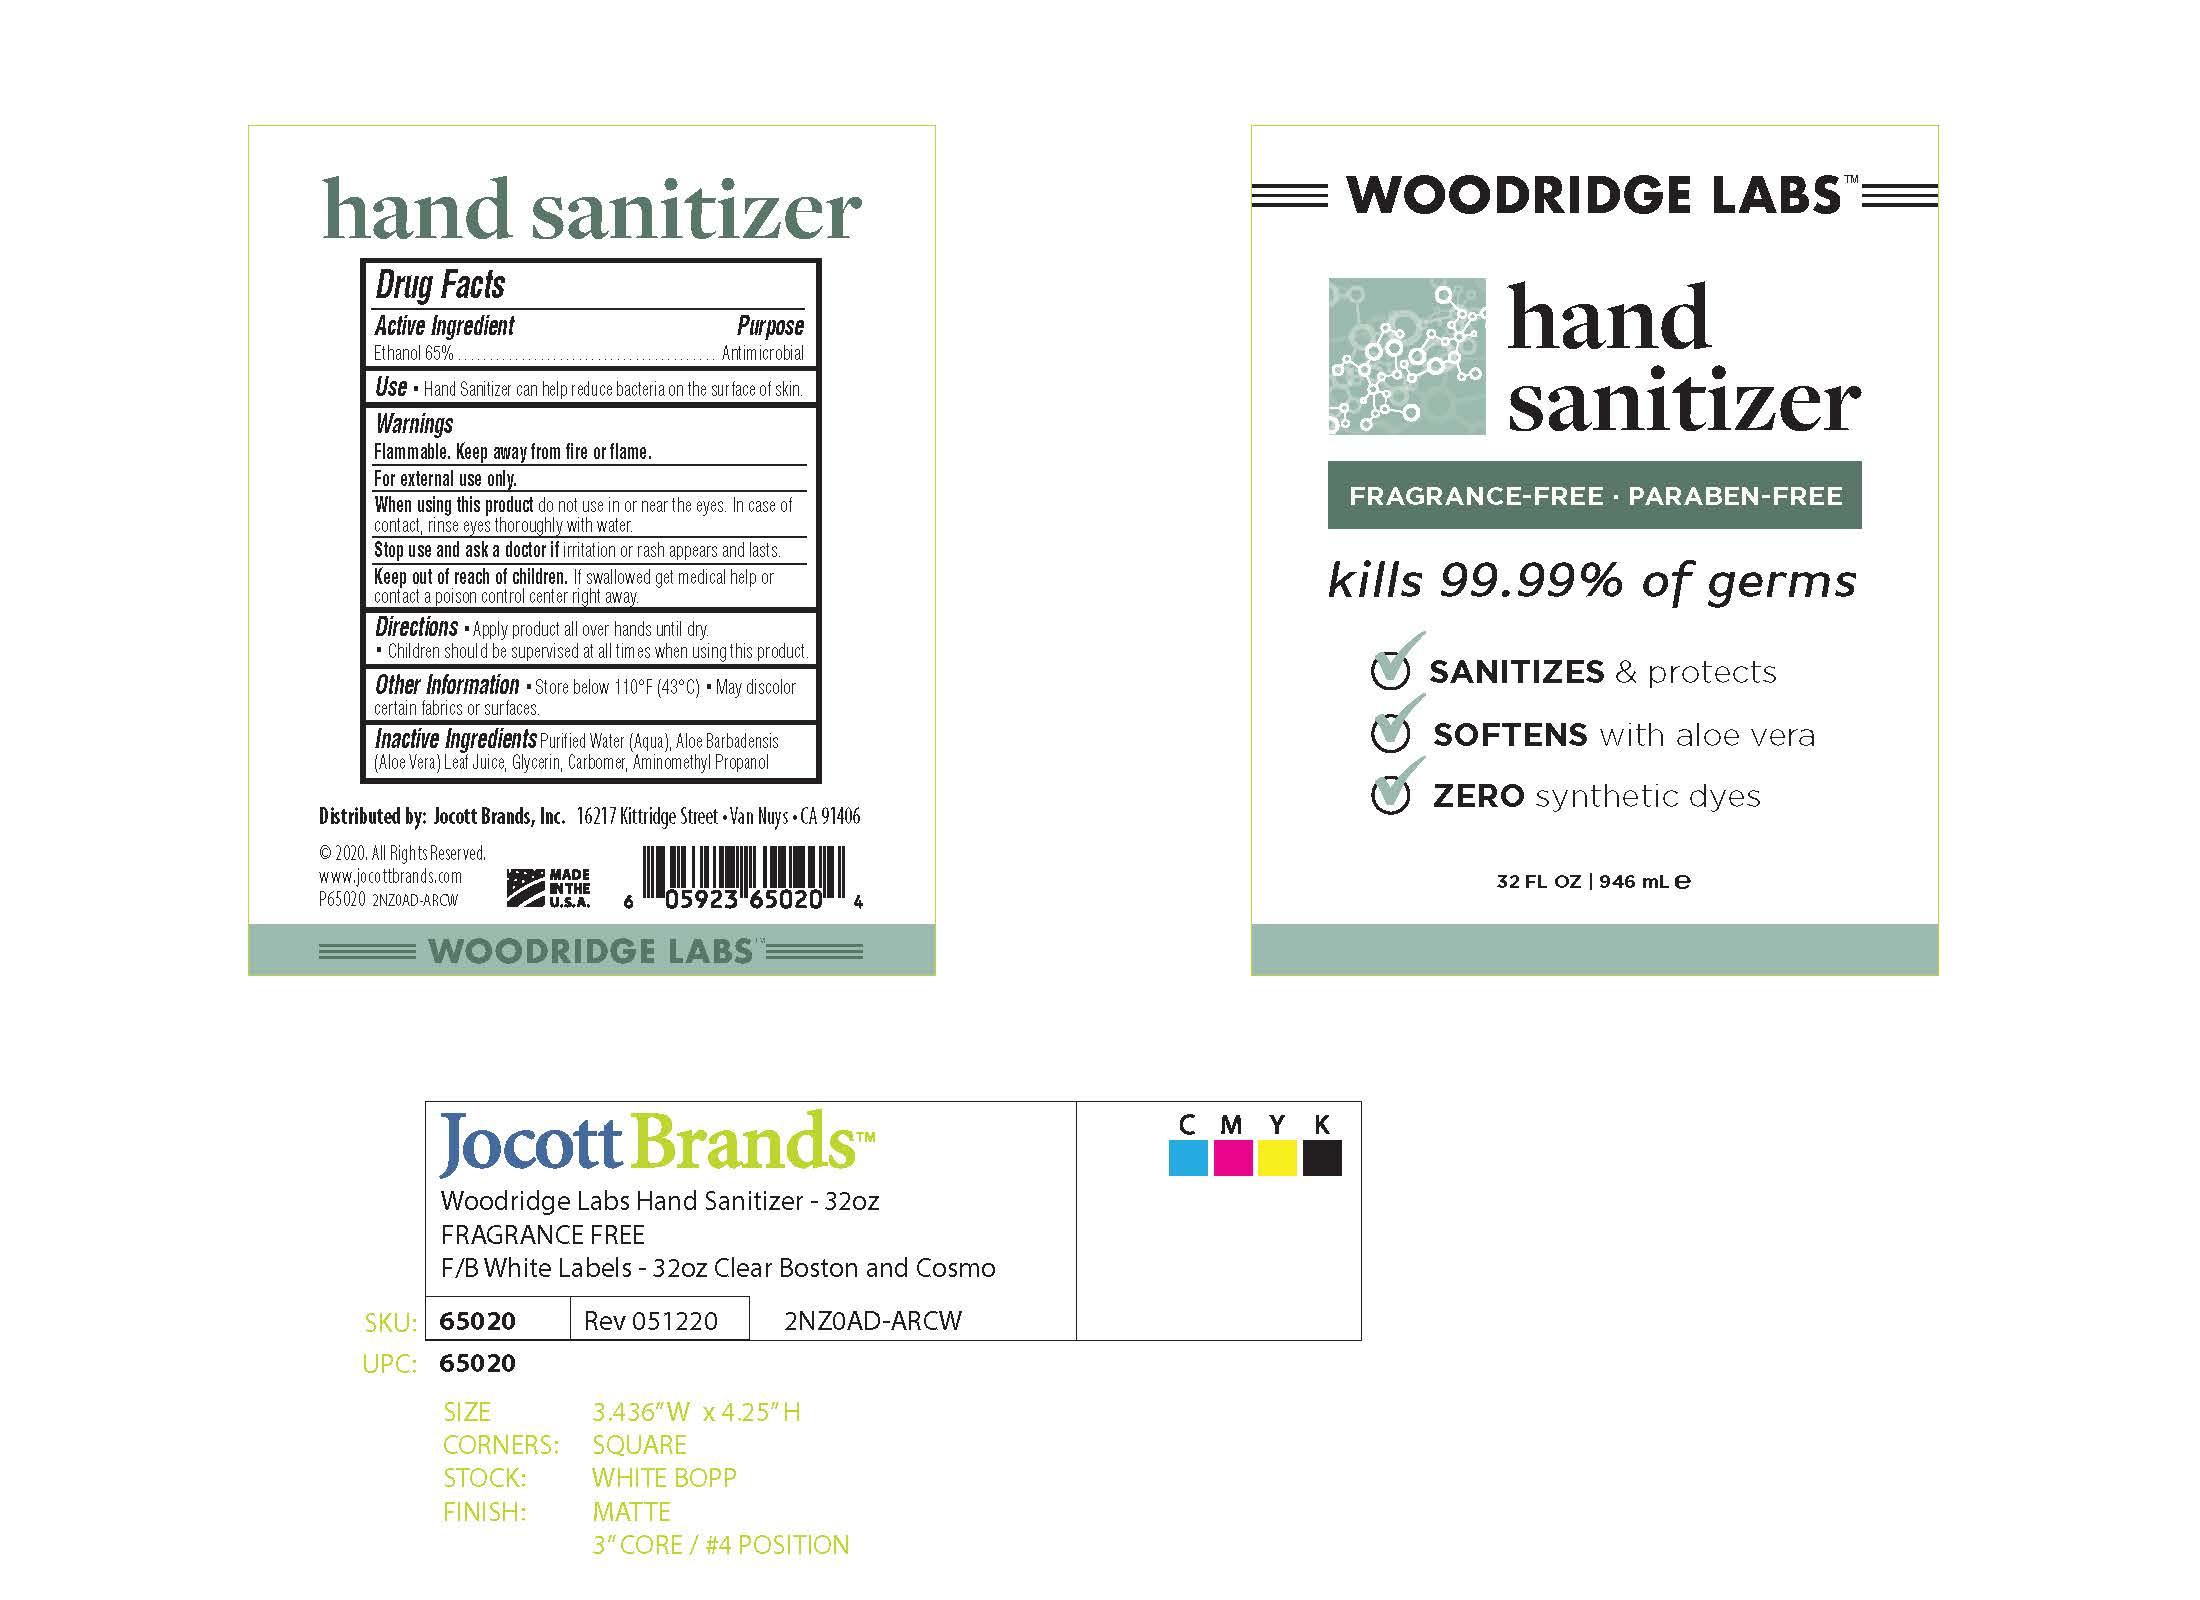 01b LBL_Woodridge Labs_Hand Sani 65pct EtOH_32oz